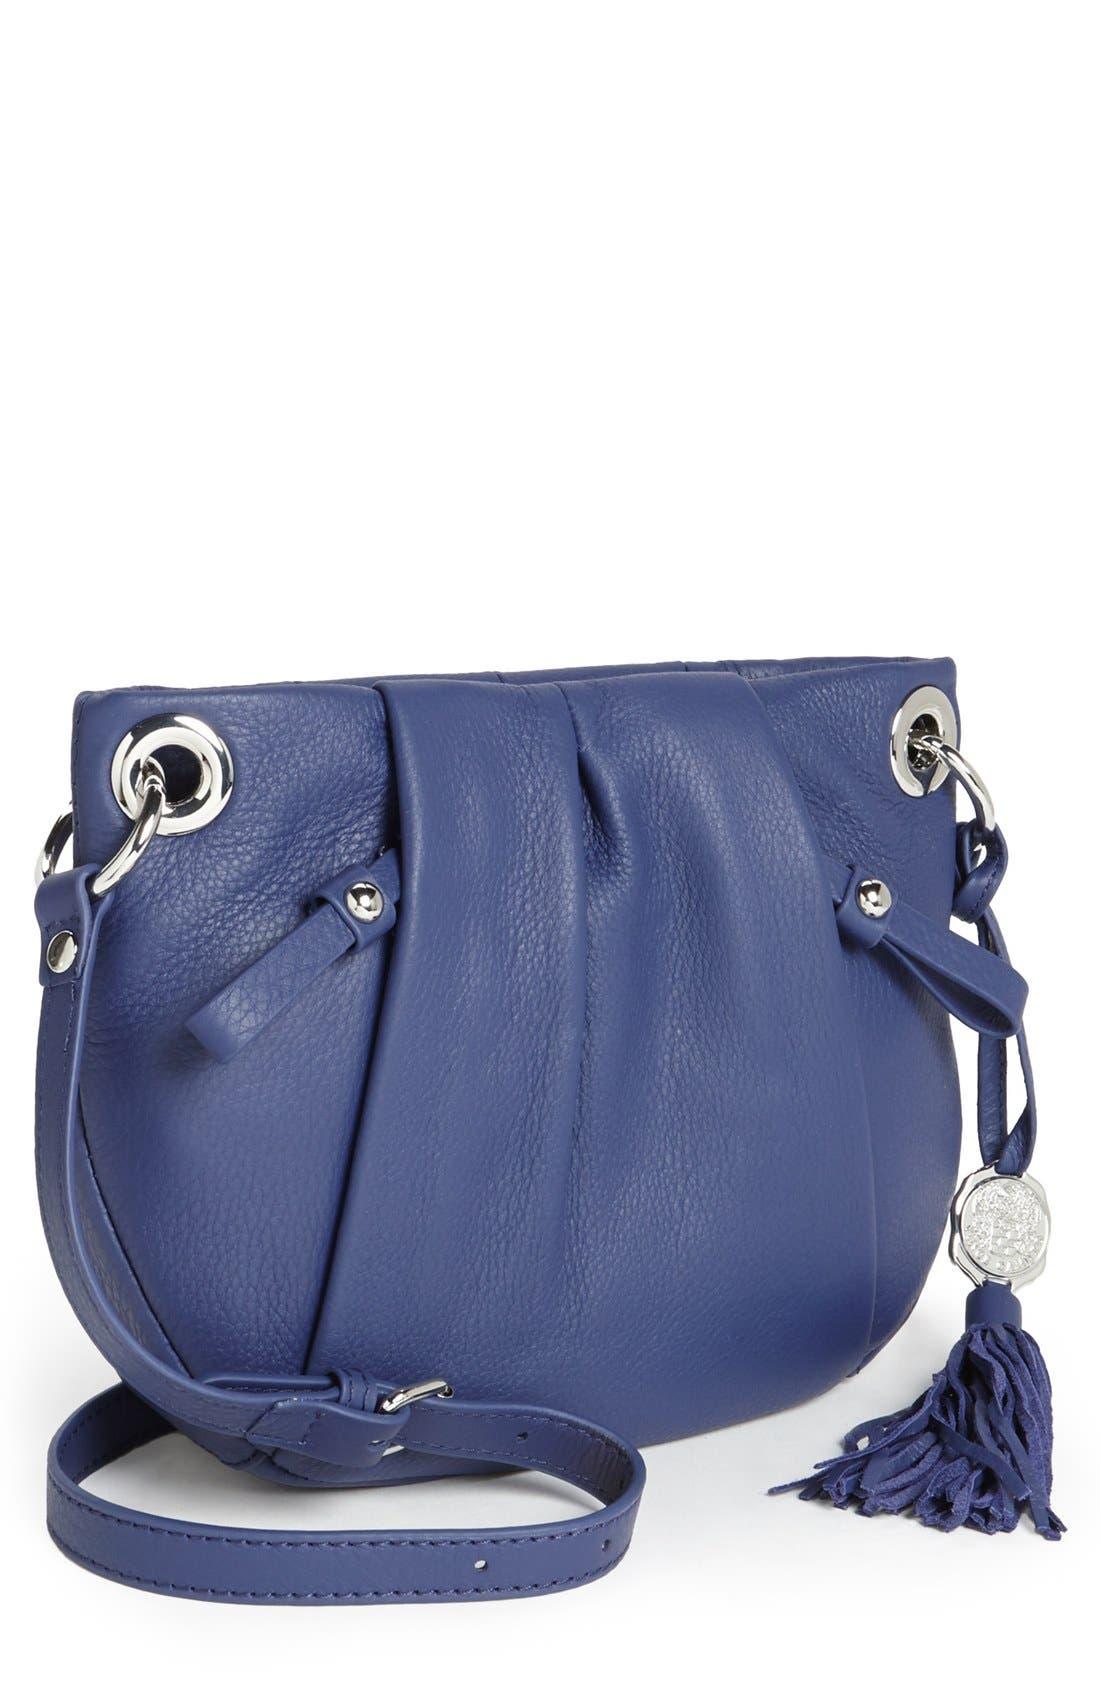 Main Image - Vince Camuto 'Cristina' Crossbody Bag